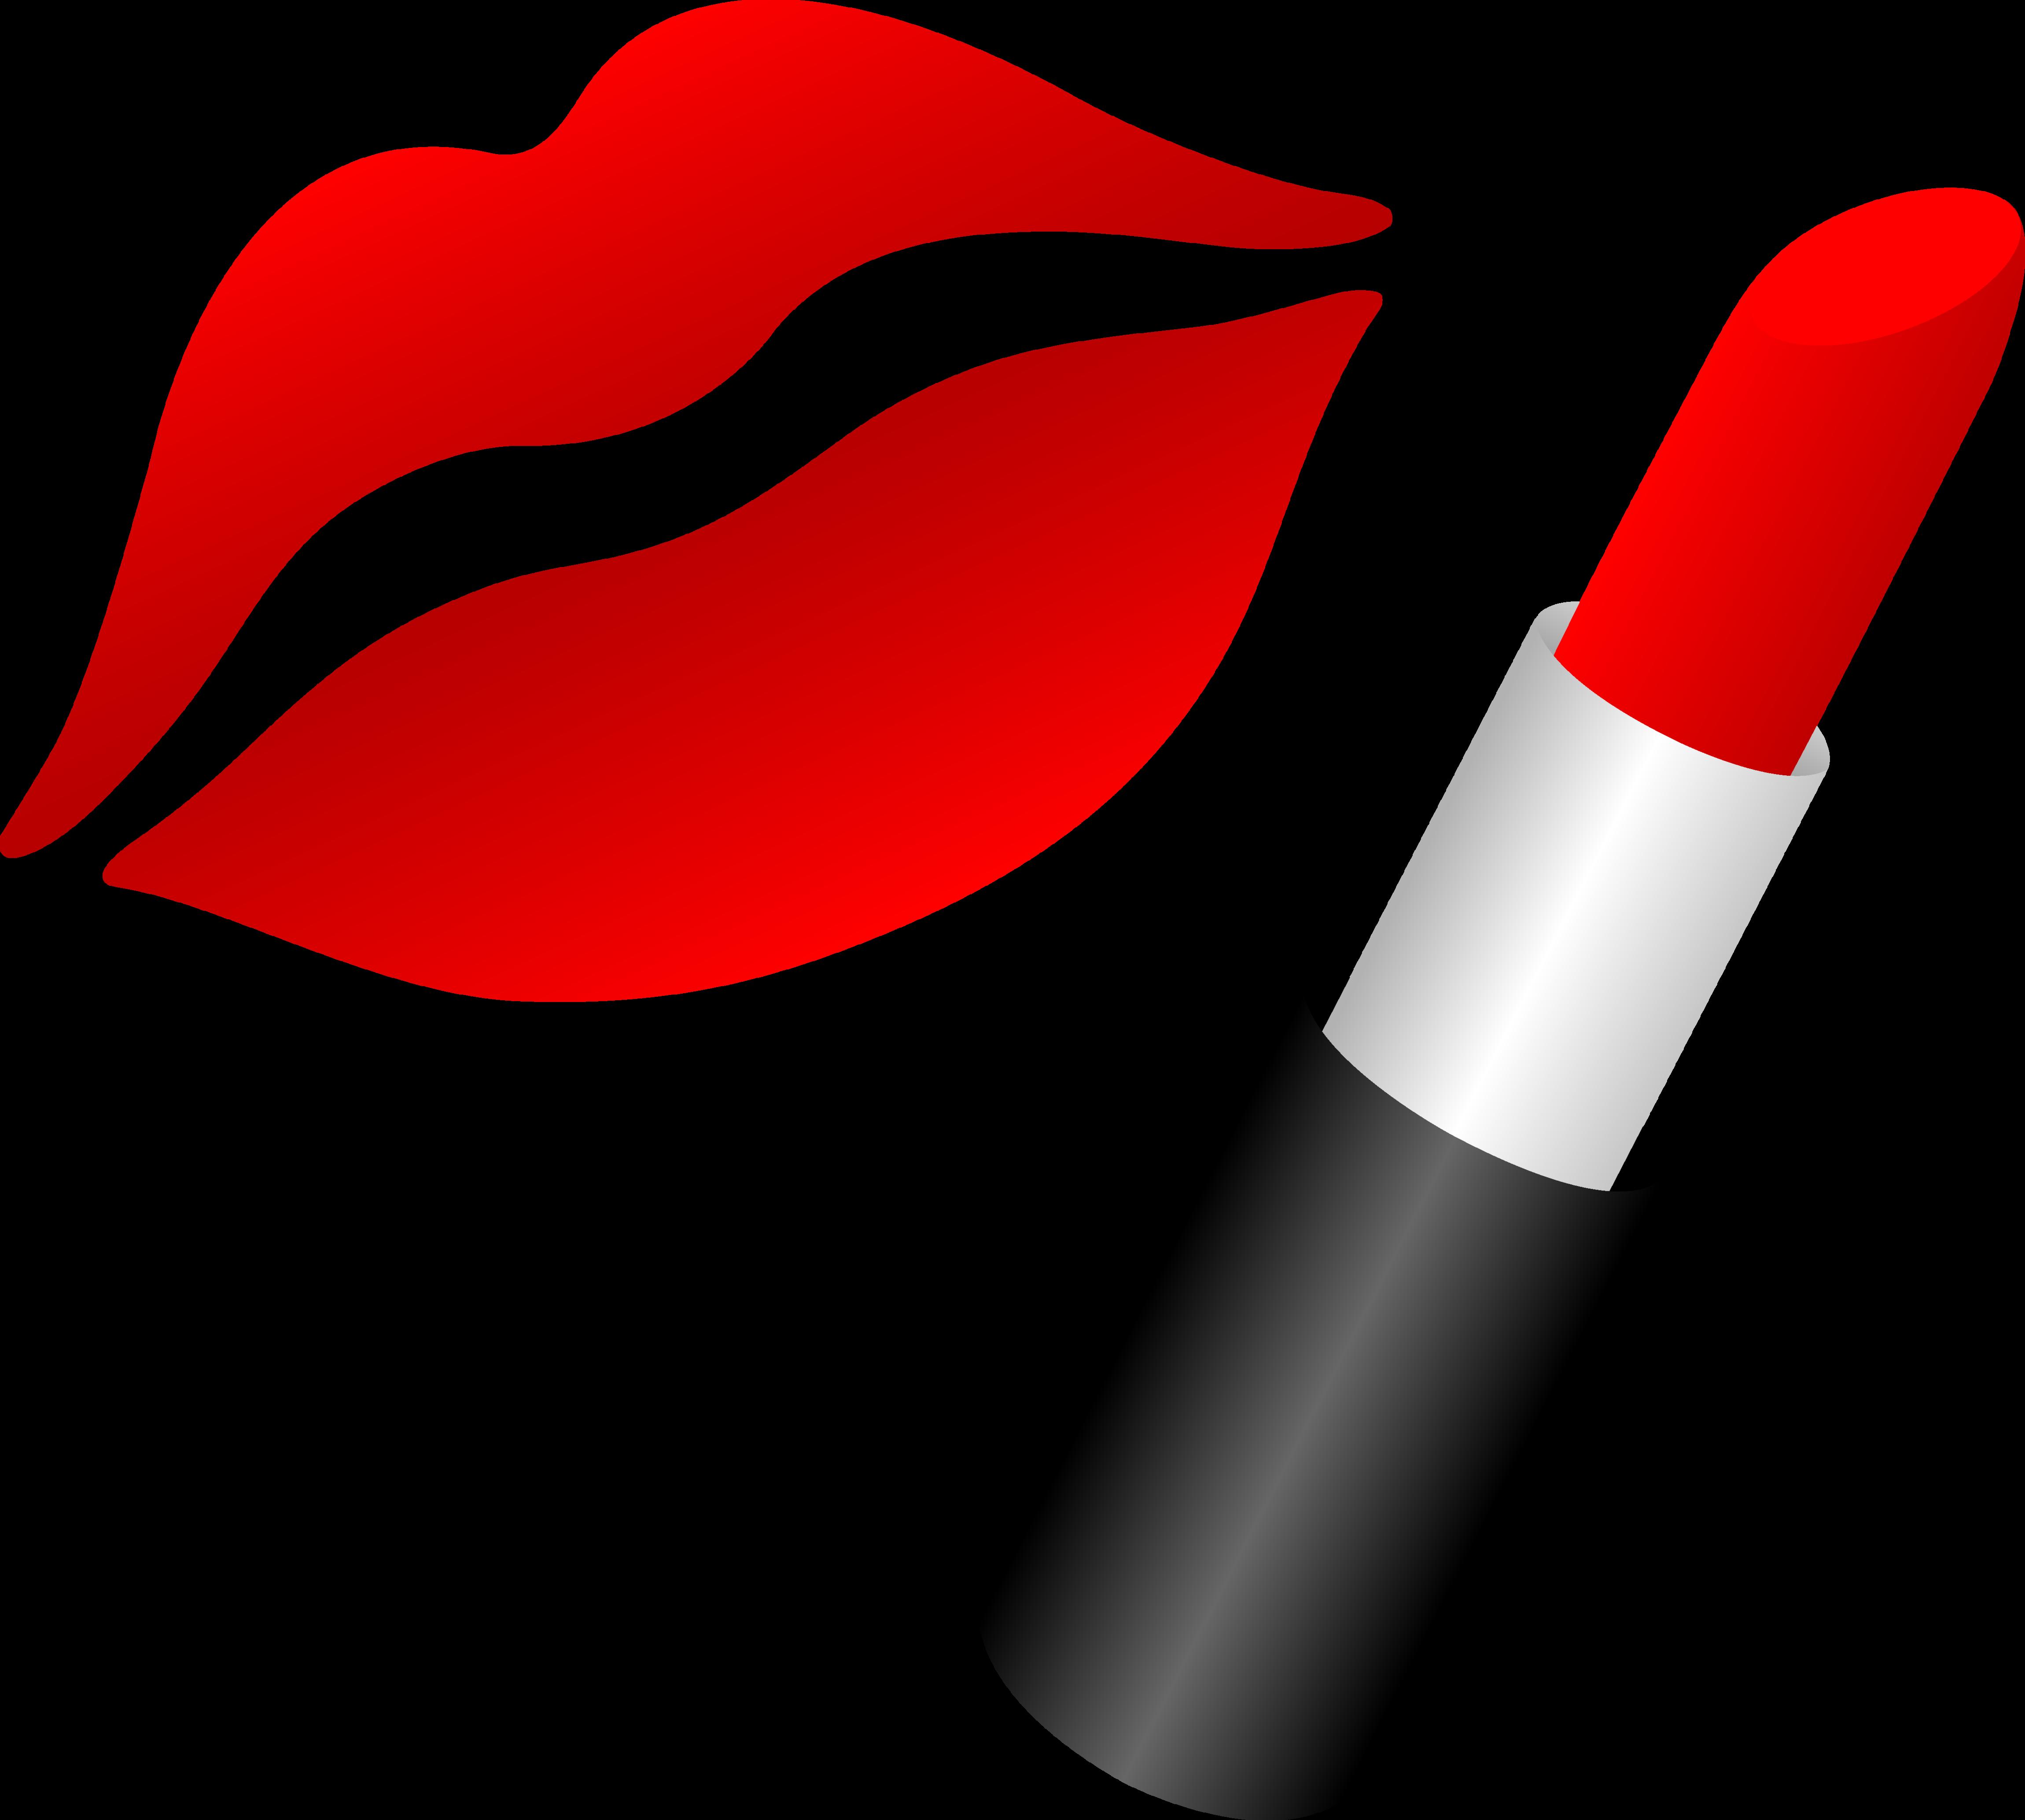 Makeup Free Lipstick Clipart Clip art of Lipstick Clipart #4679.